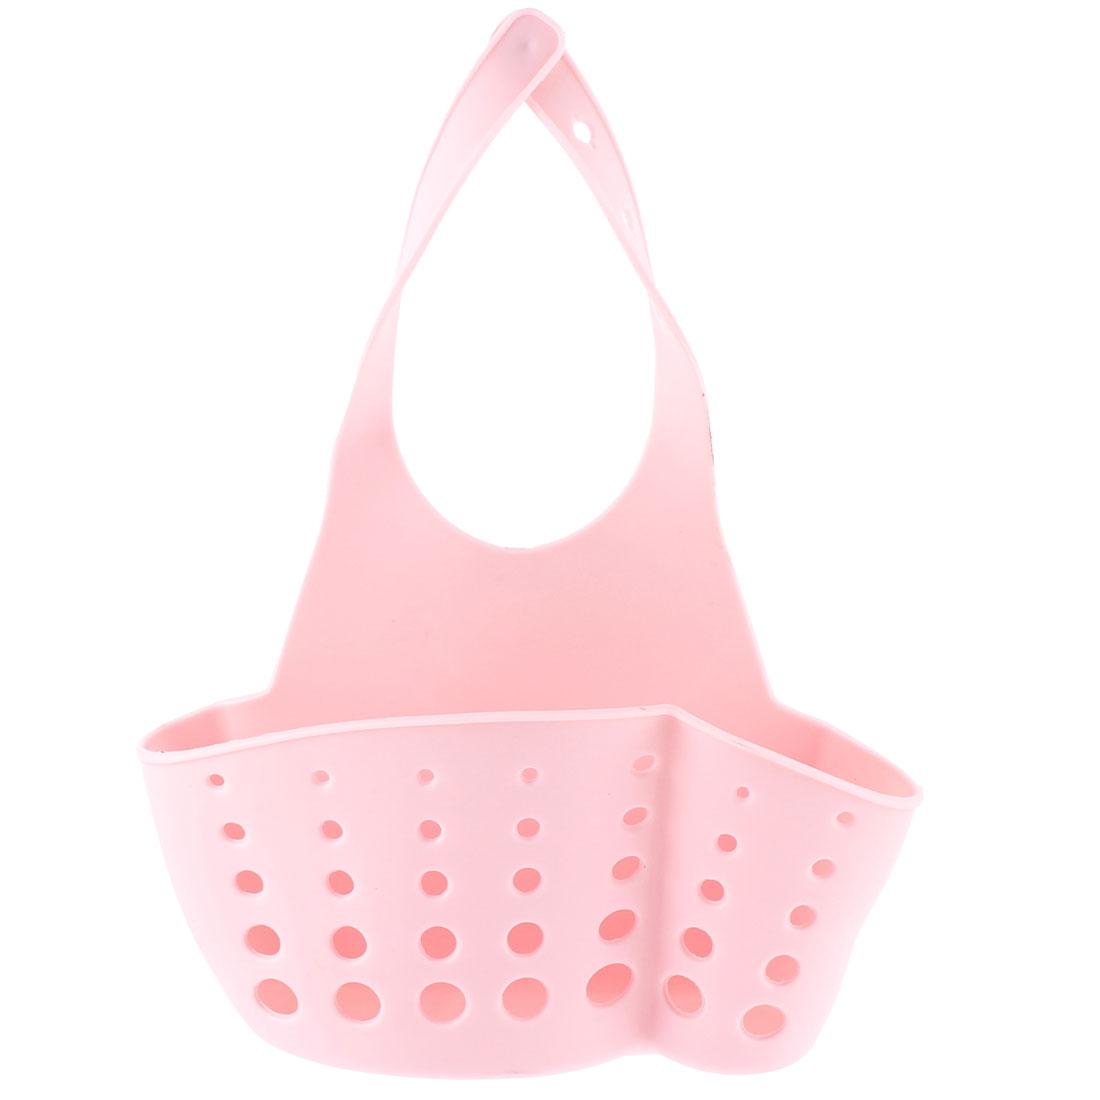 Bathroom PVC Faucet Dish Washing Tool Strainers Holder Basket Pink